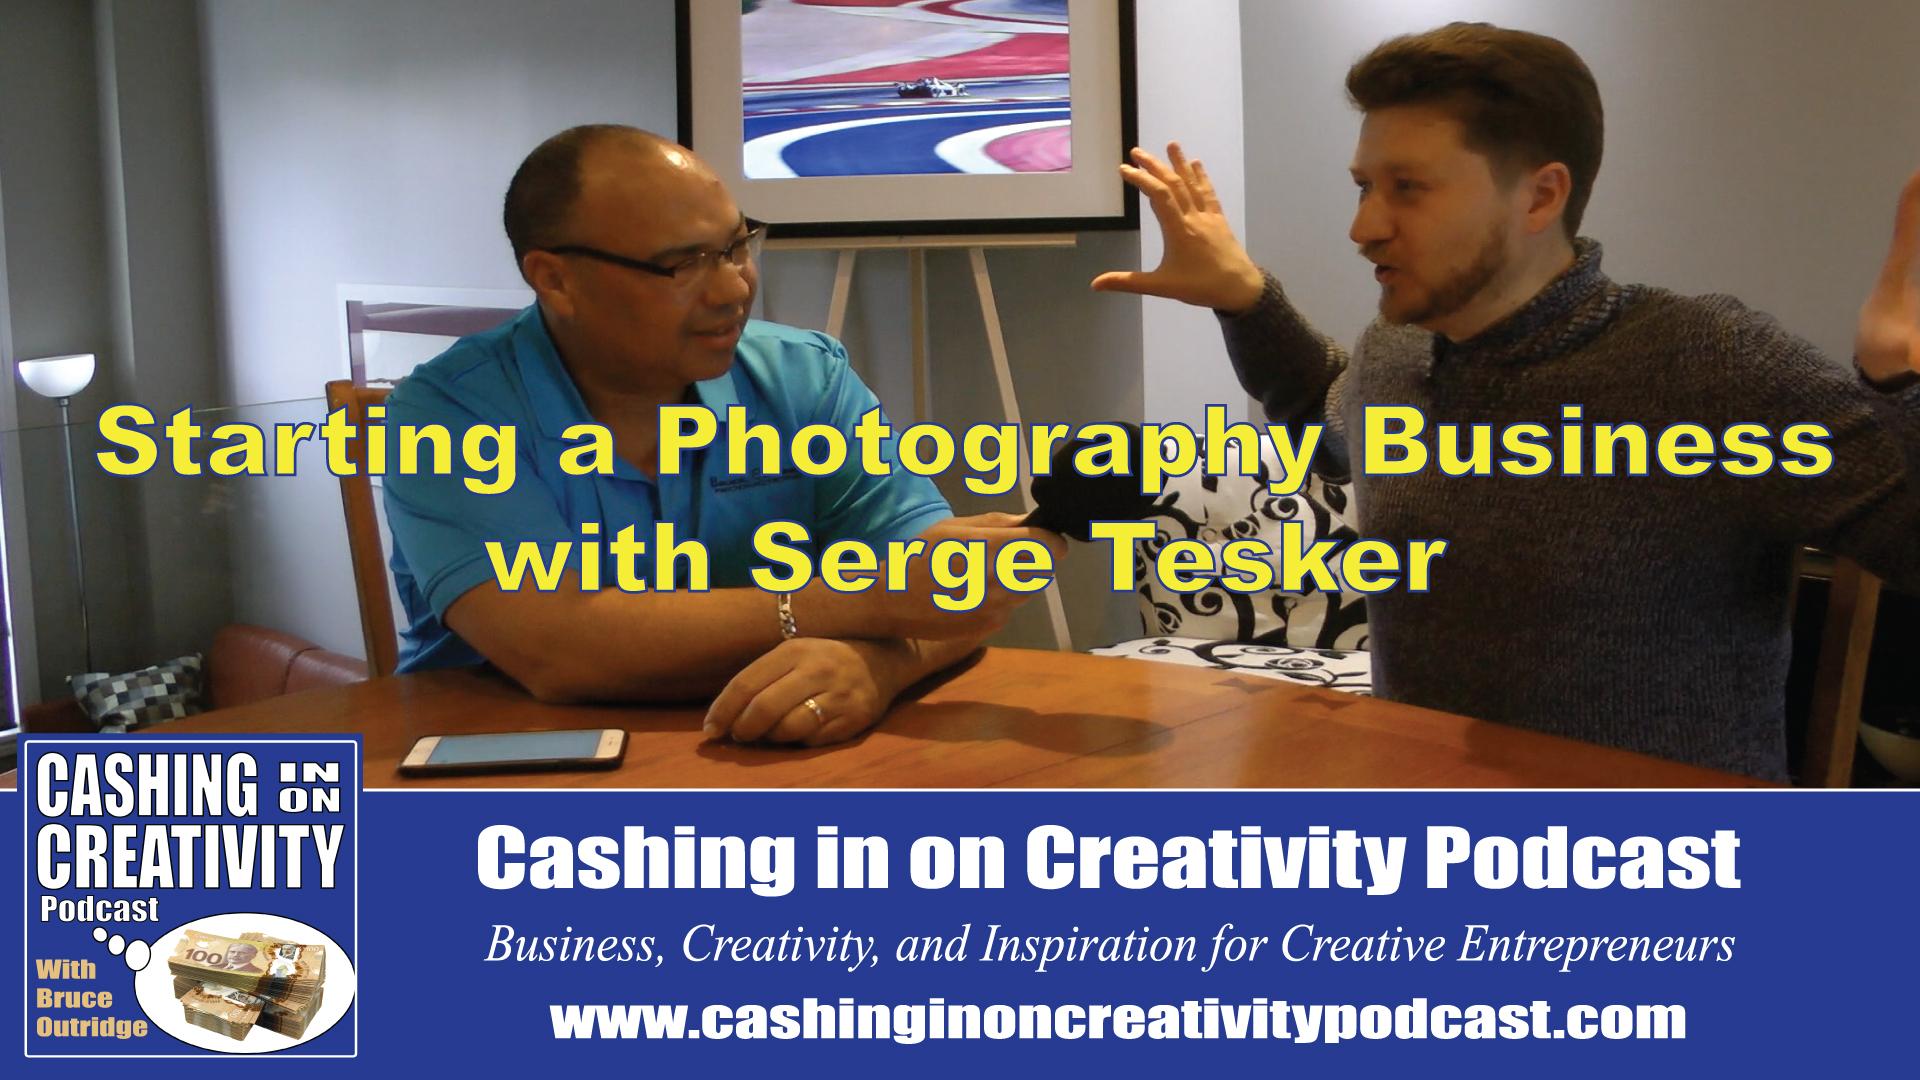 Photgrapher Serge Tesker